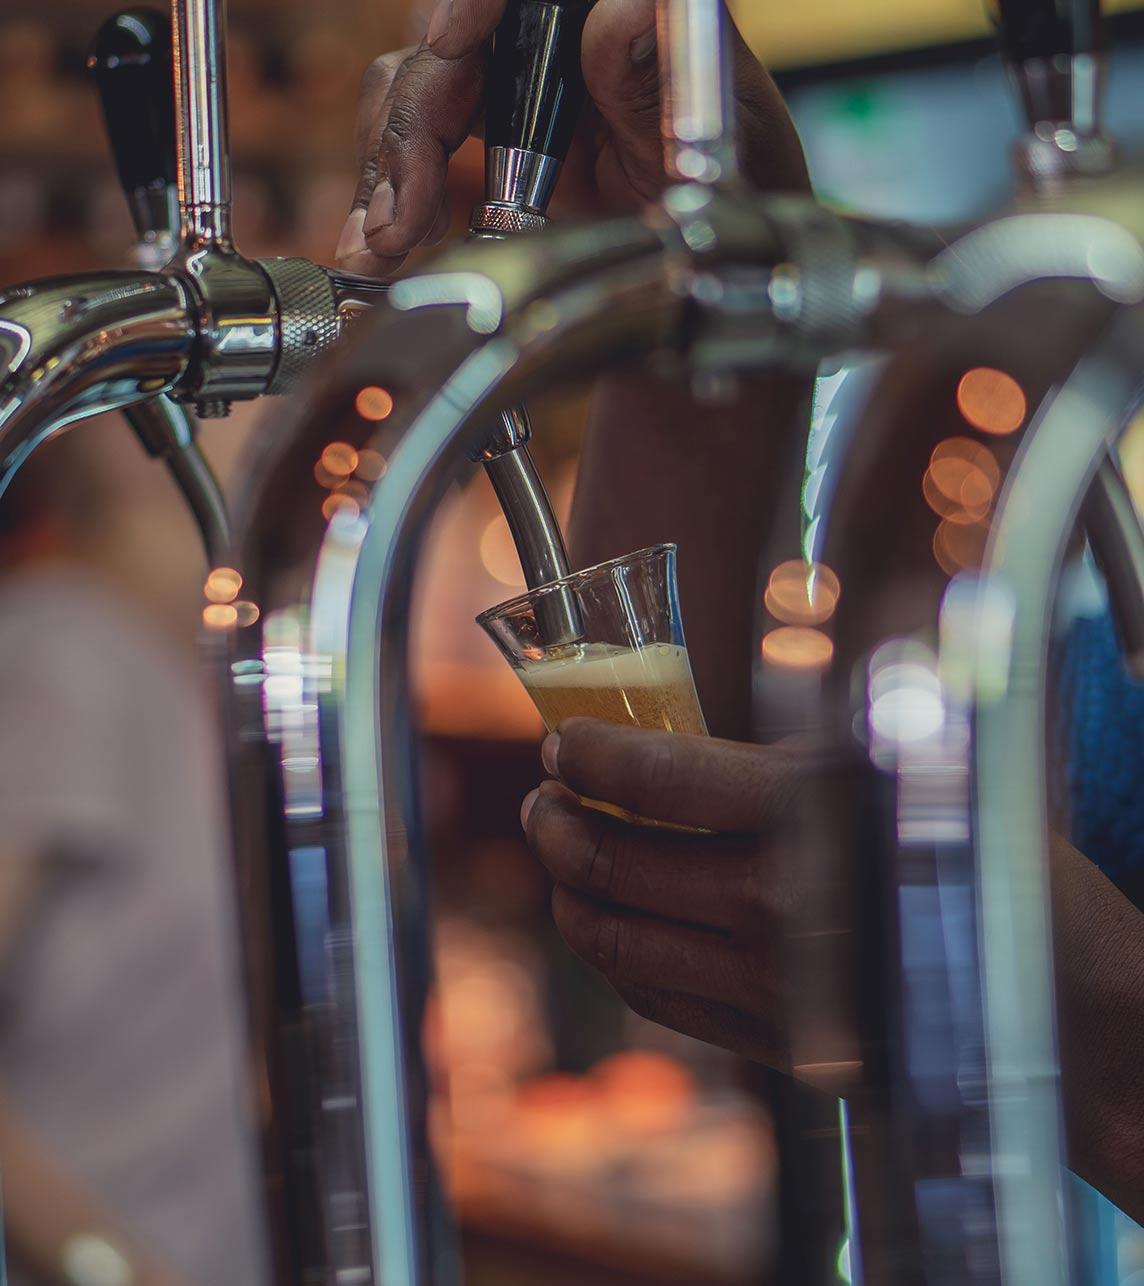 https://kdbc.co.za/wp-content/uploads/2019/09/beer.jpg